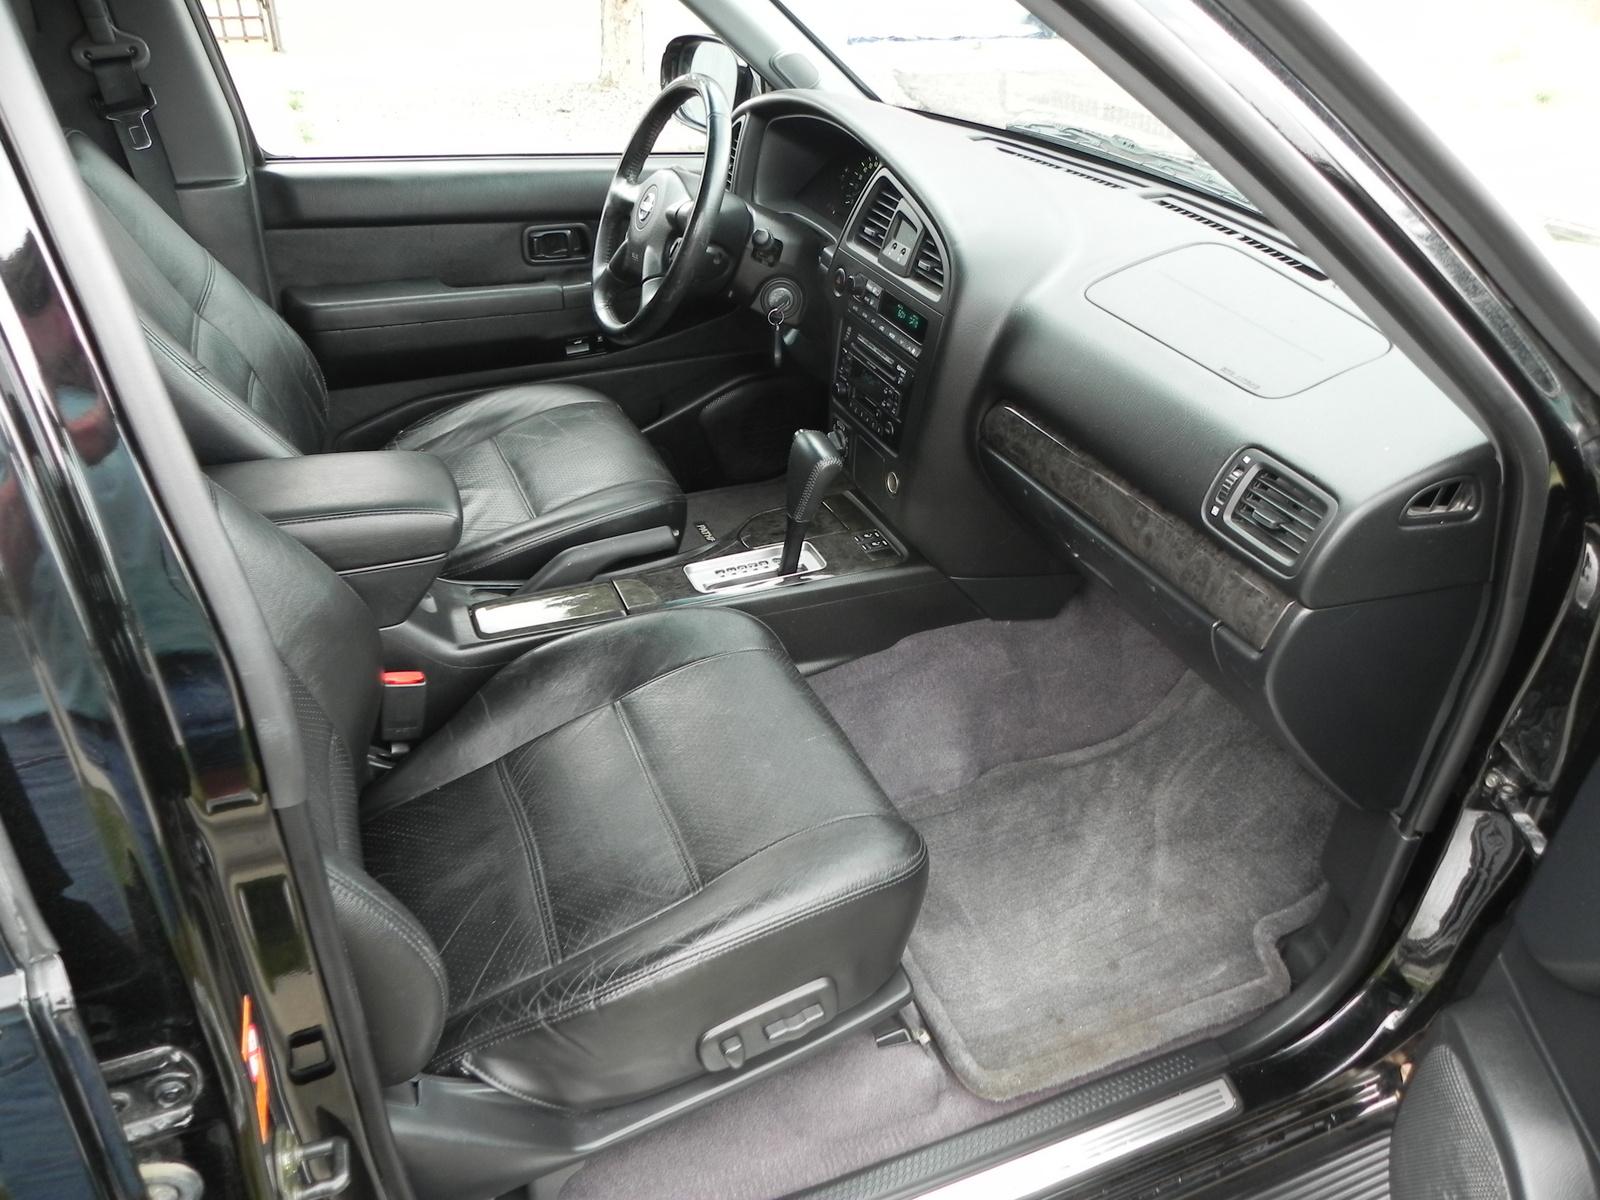 2004 Nissan Pathfinder Le Platinum Edition 4wd For Sale In Car Interior Design